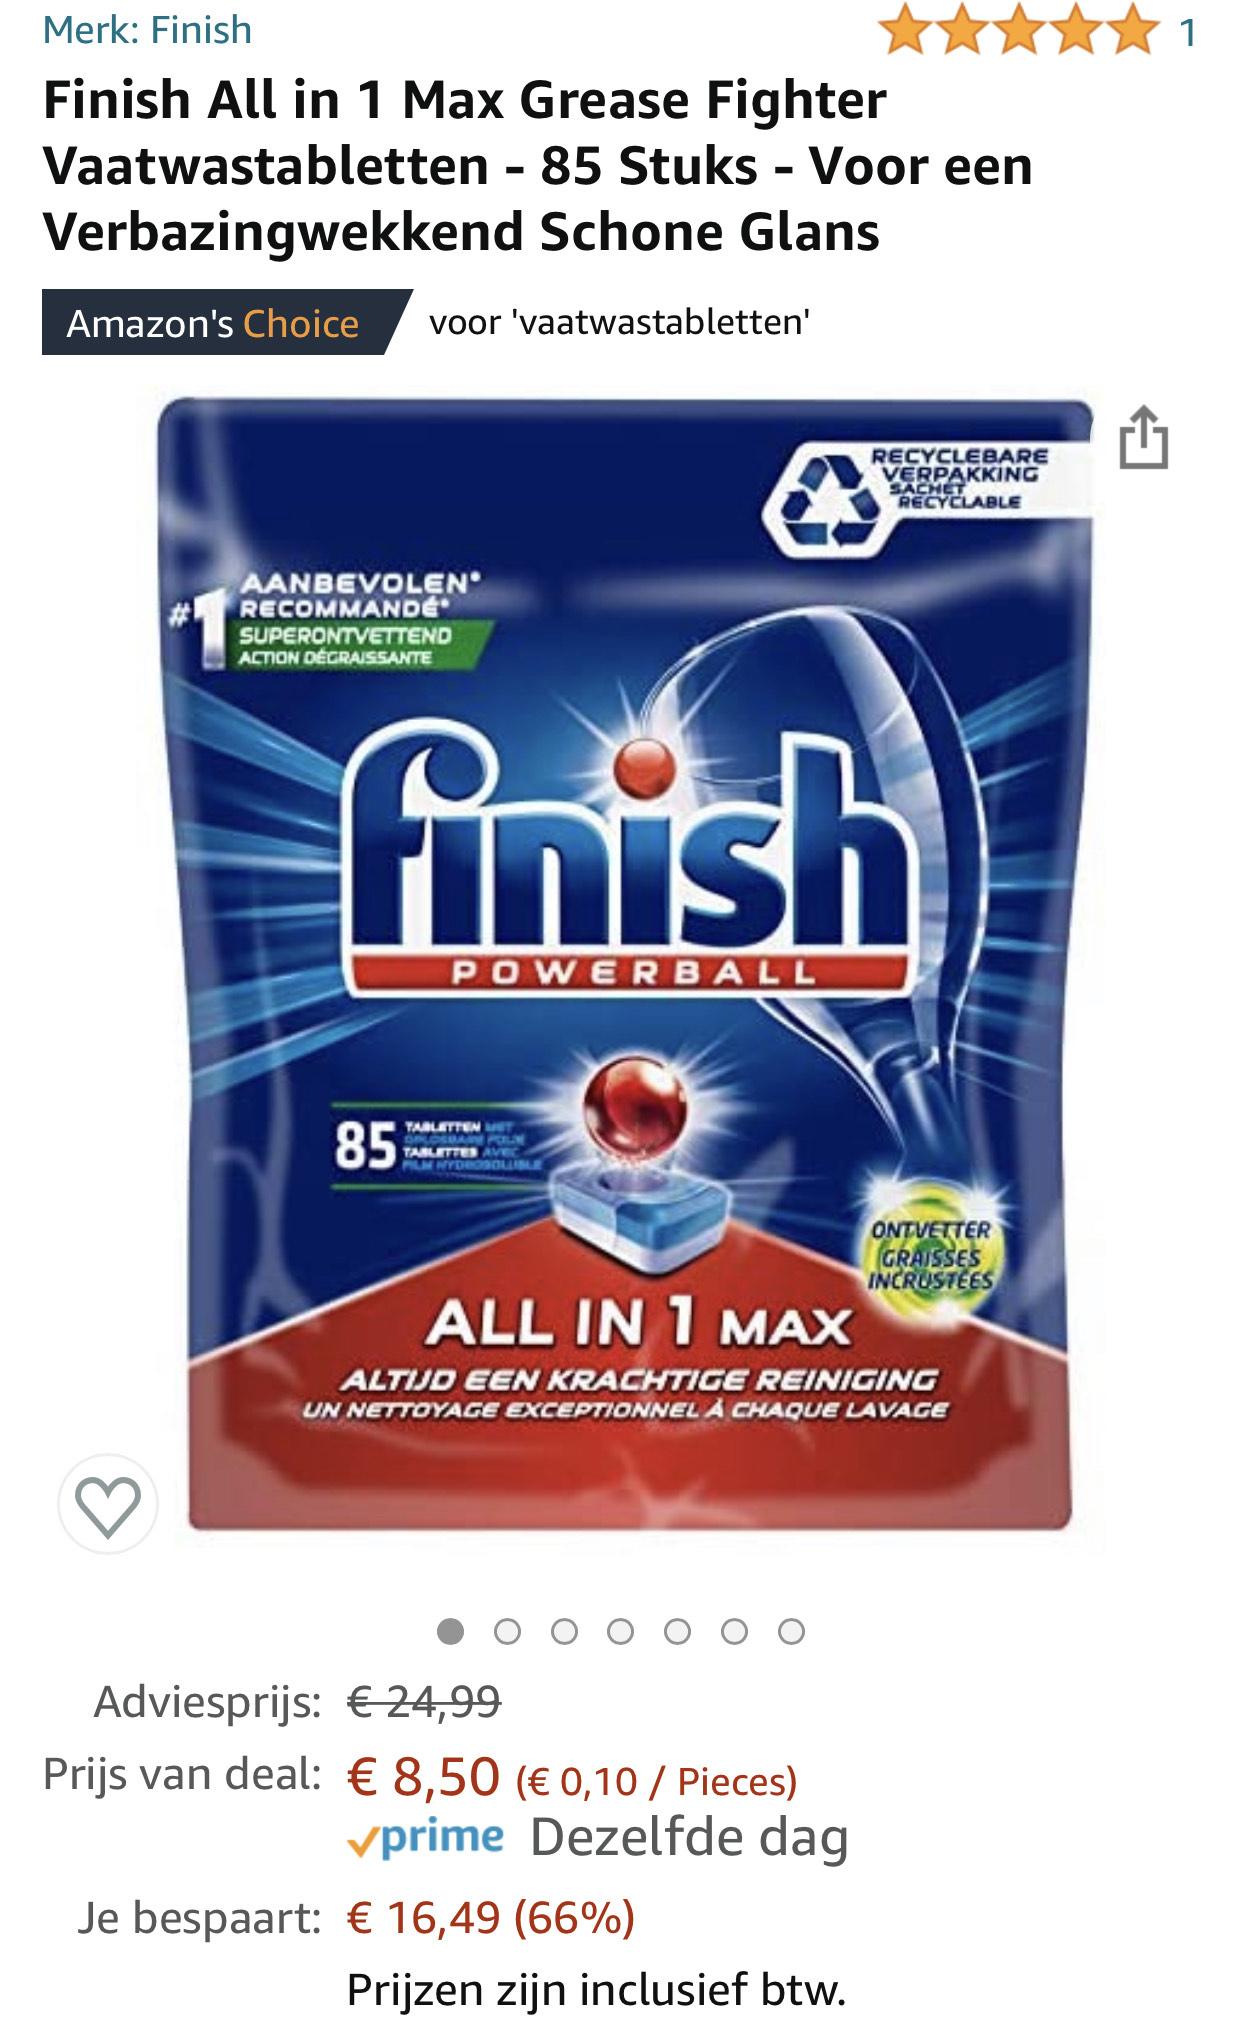 Finish All in 1 max vaatwastabletten